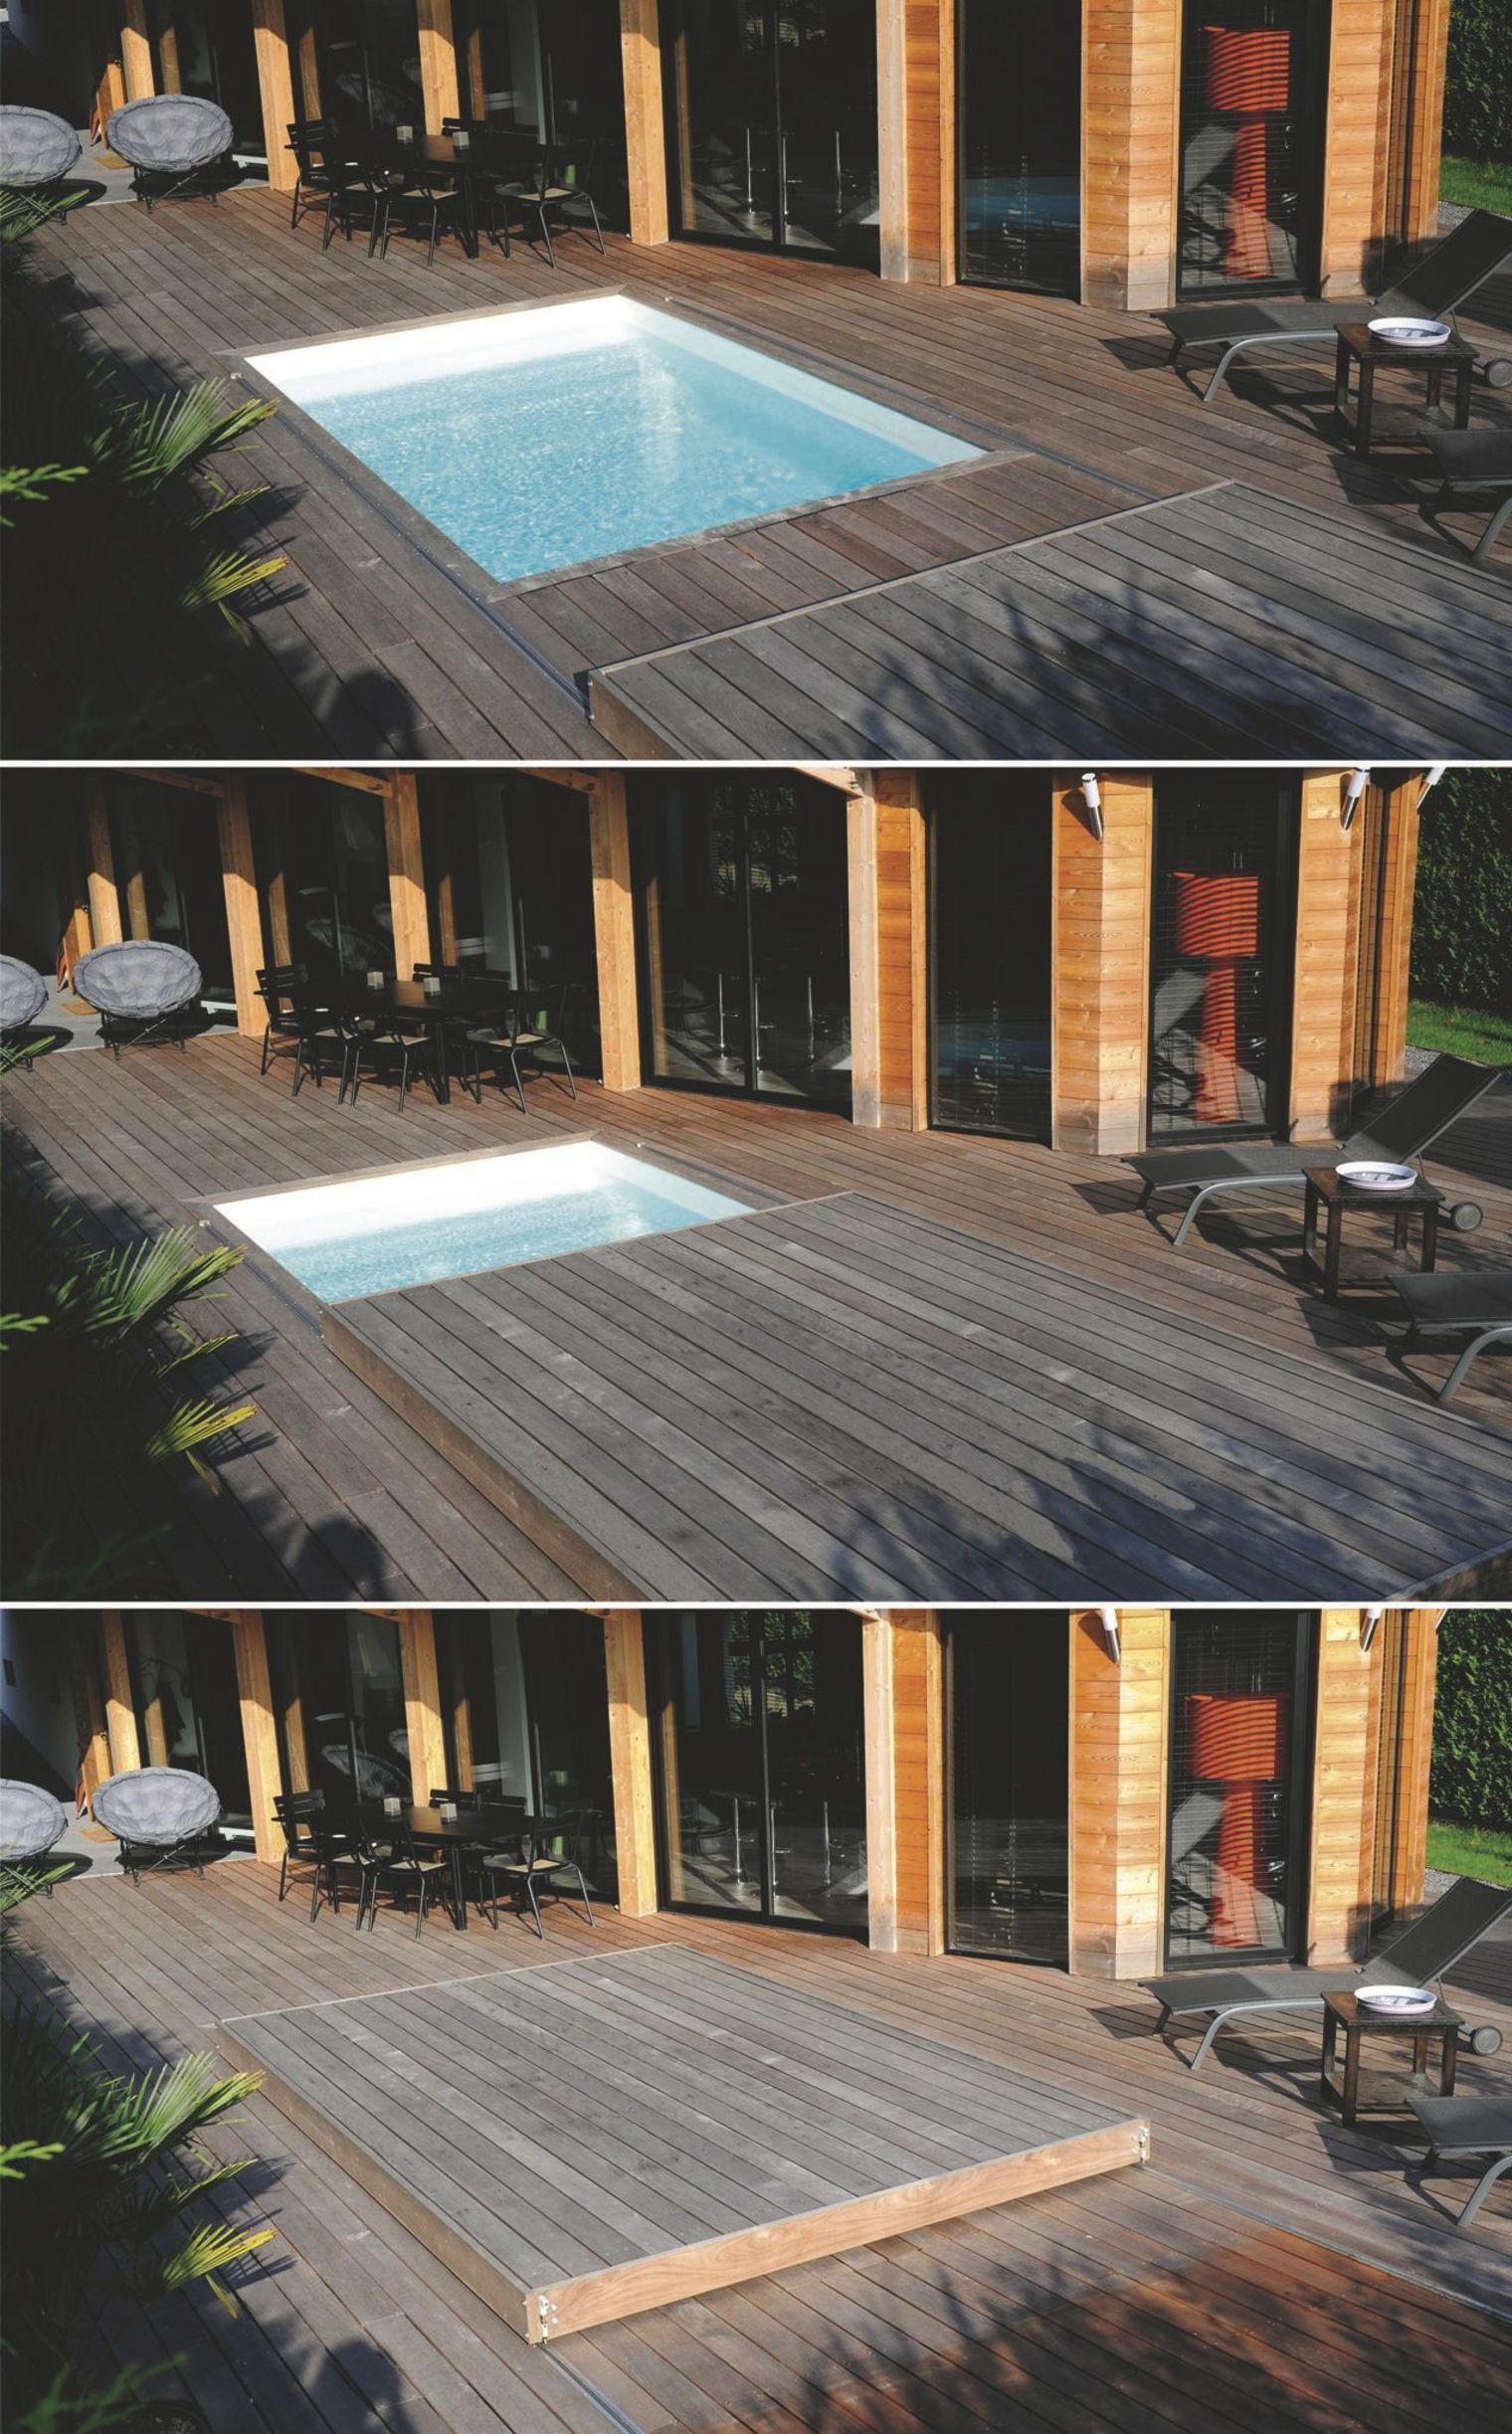 www goodshomedesign com custom rolling deck fitted pools. www goodshomedesign com custom rolling deck fitted pools   meus